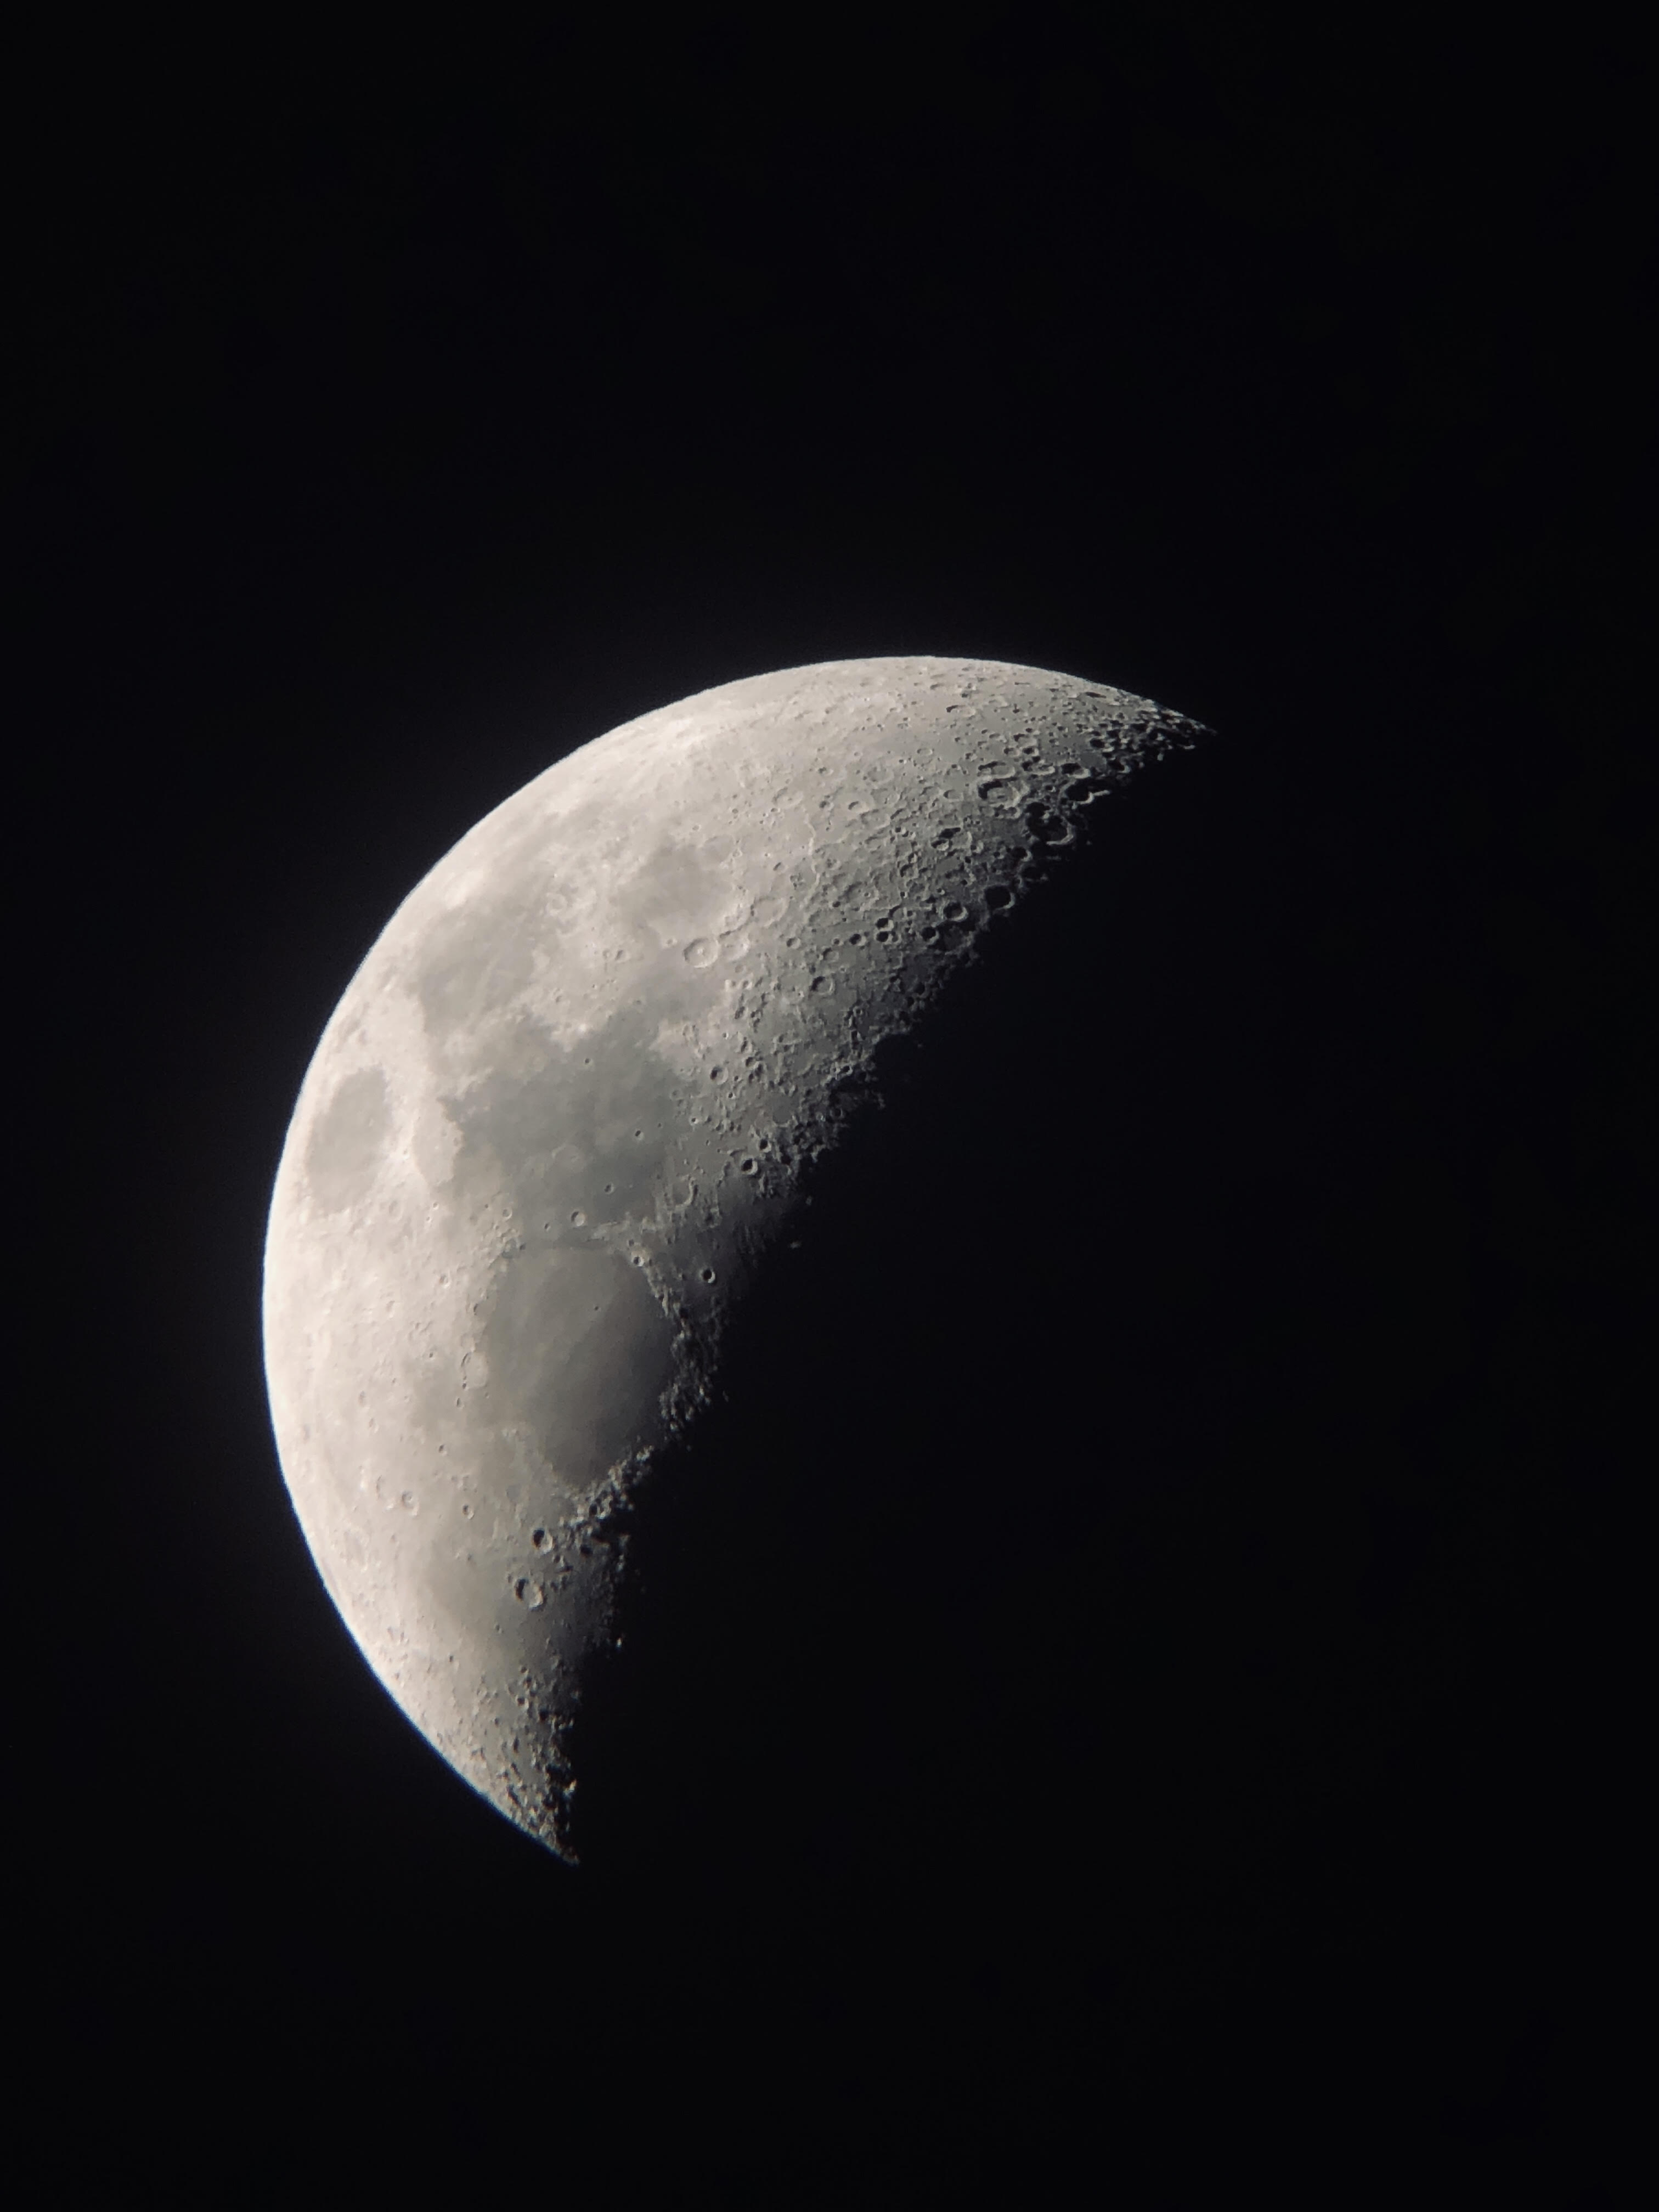 moon in dark night sky